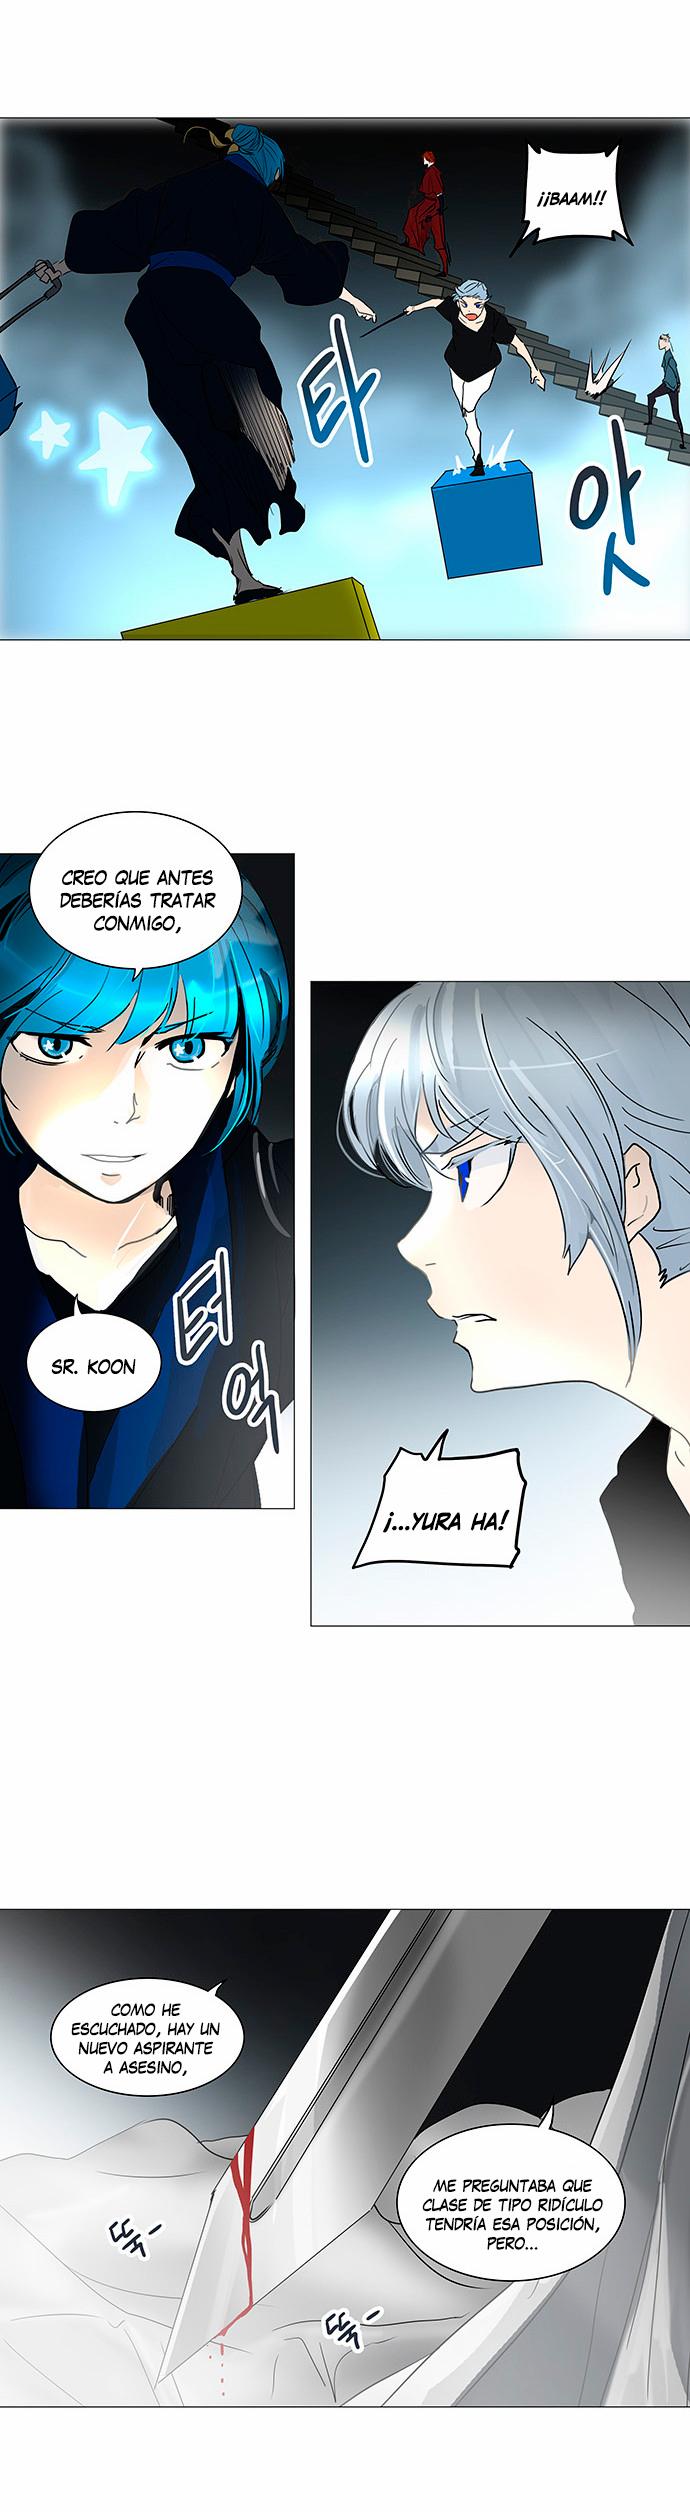 http://c5.ninemanga.com/es_manga/21/149/396507/476aa20902eb65e167d44ea8384aca04.jpg Page 7